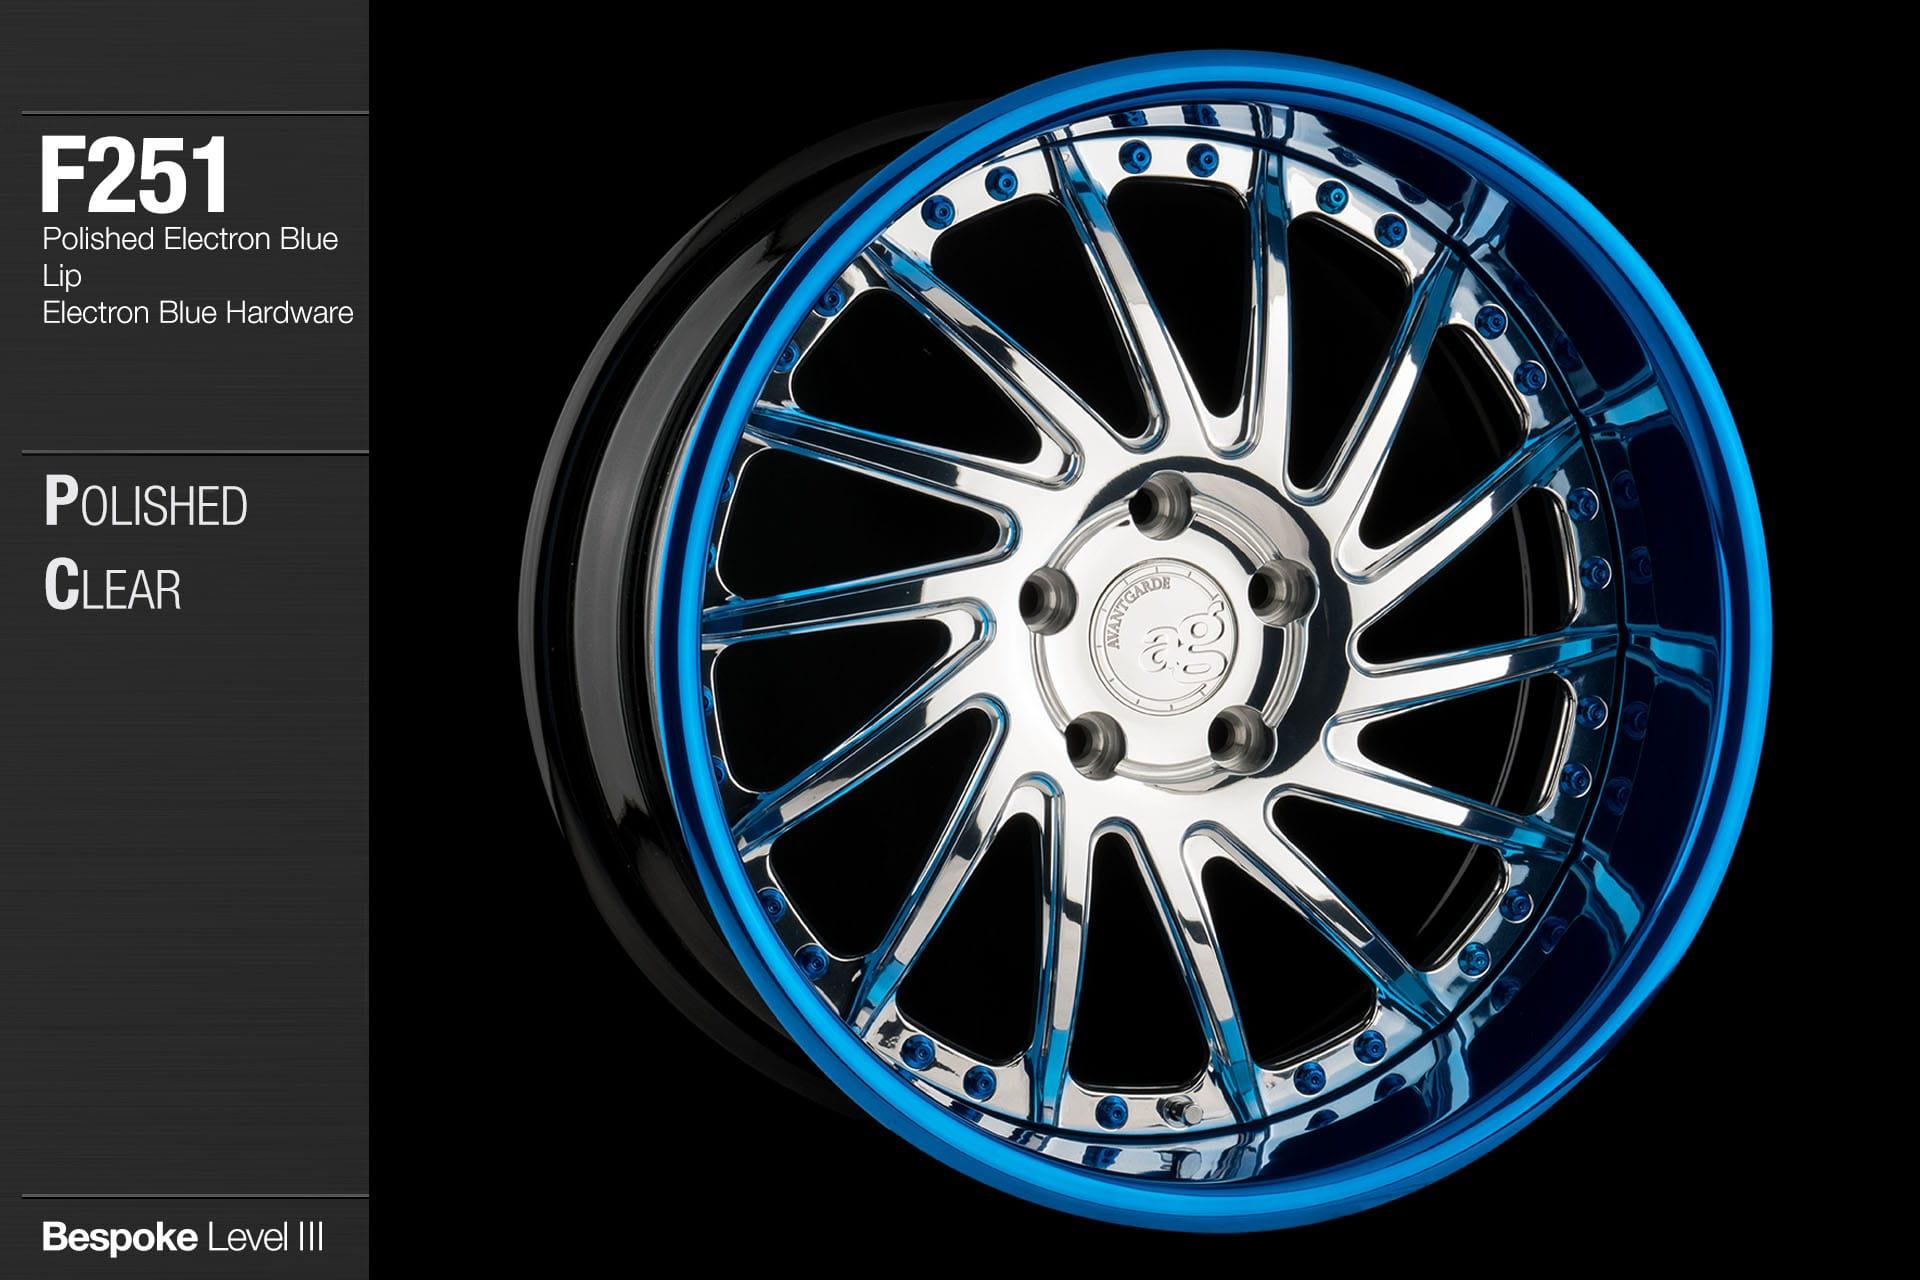 avant-garde-ag-wheels-f251-polished-clear-face-polished-electron-blue-lip-hardware-4-min